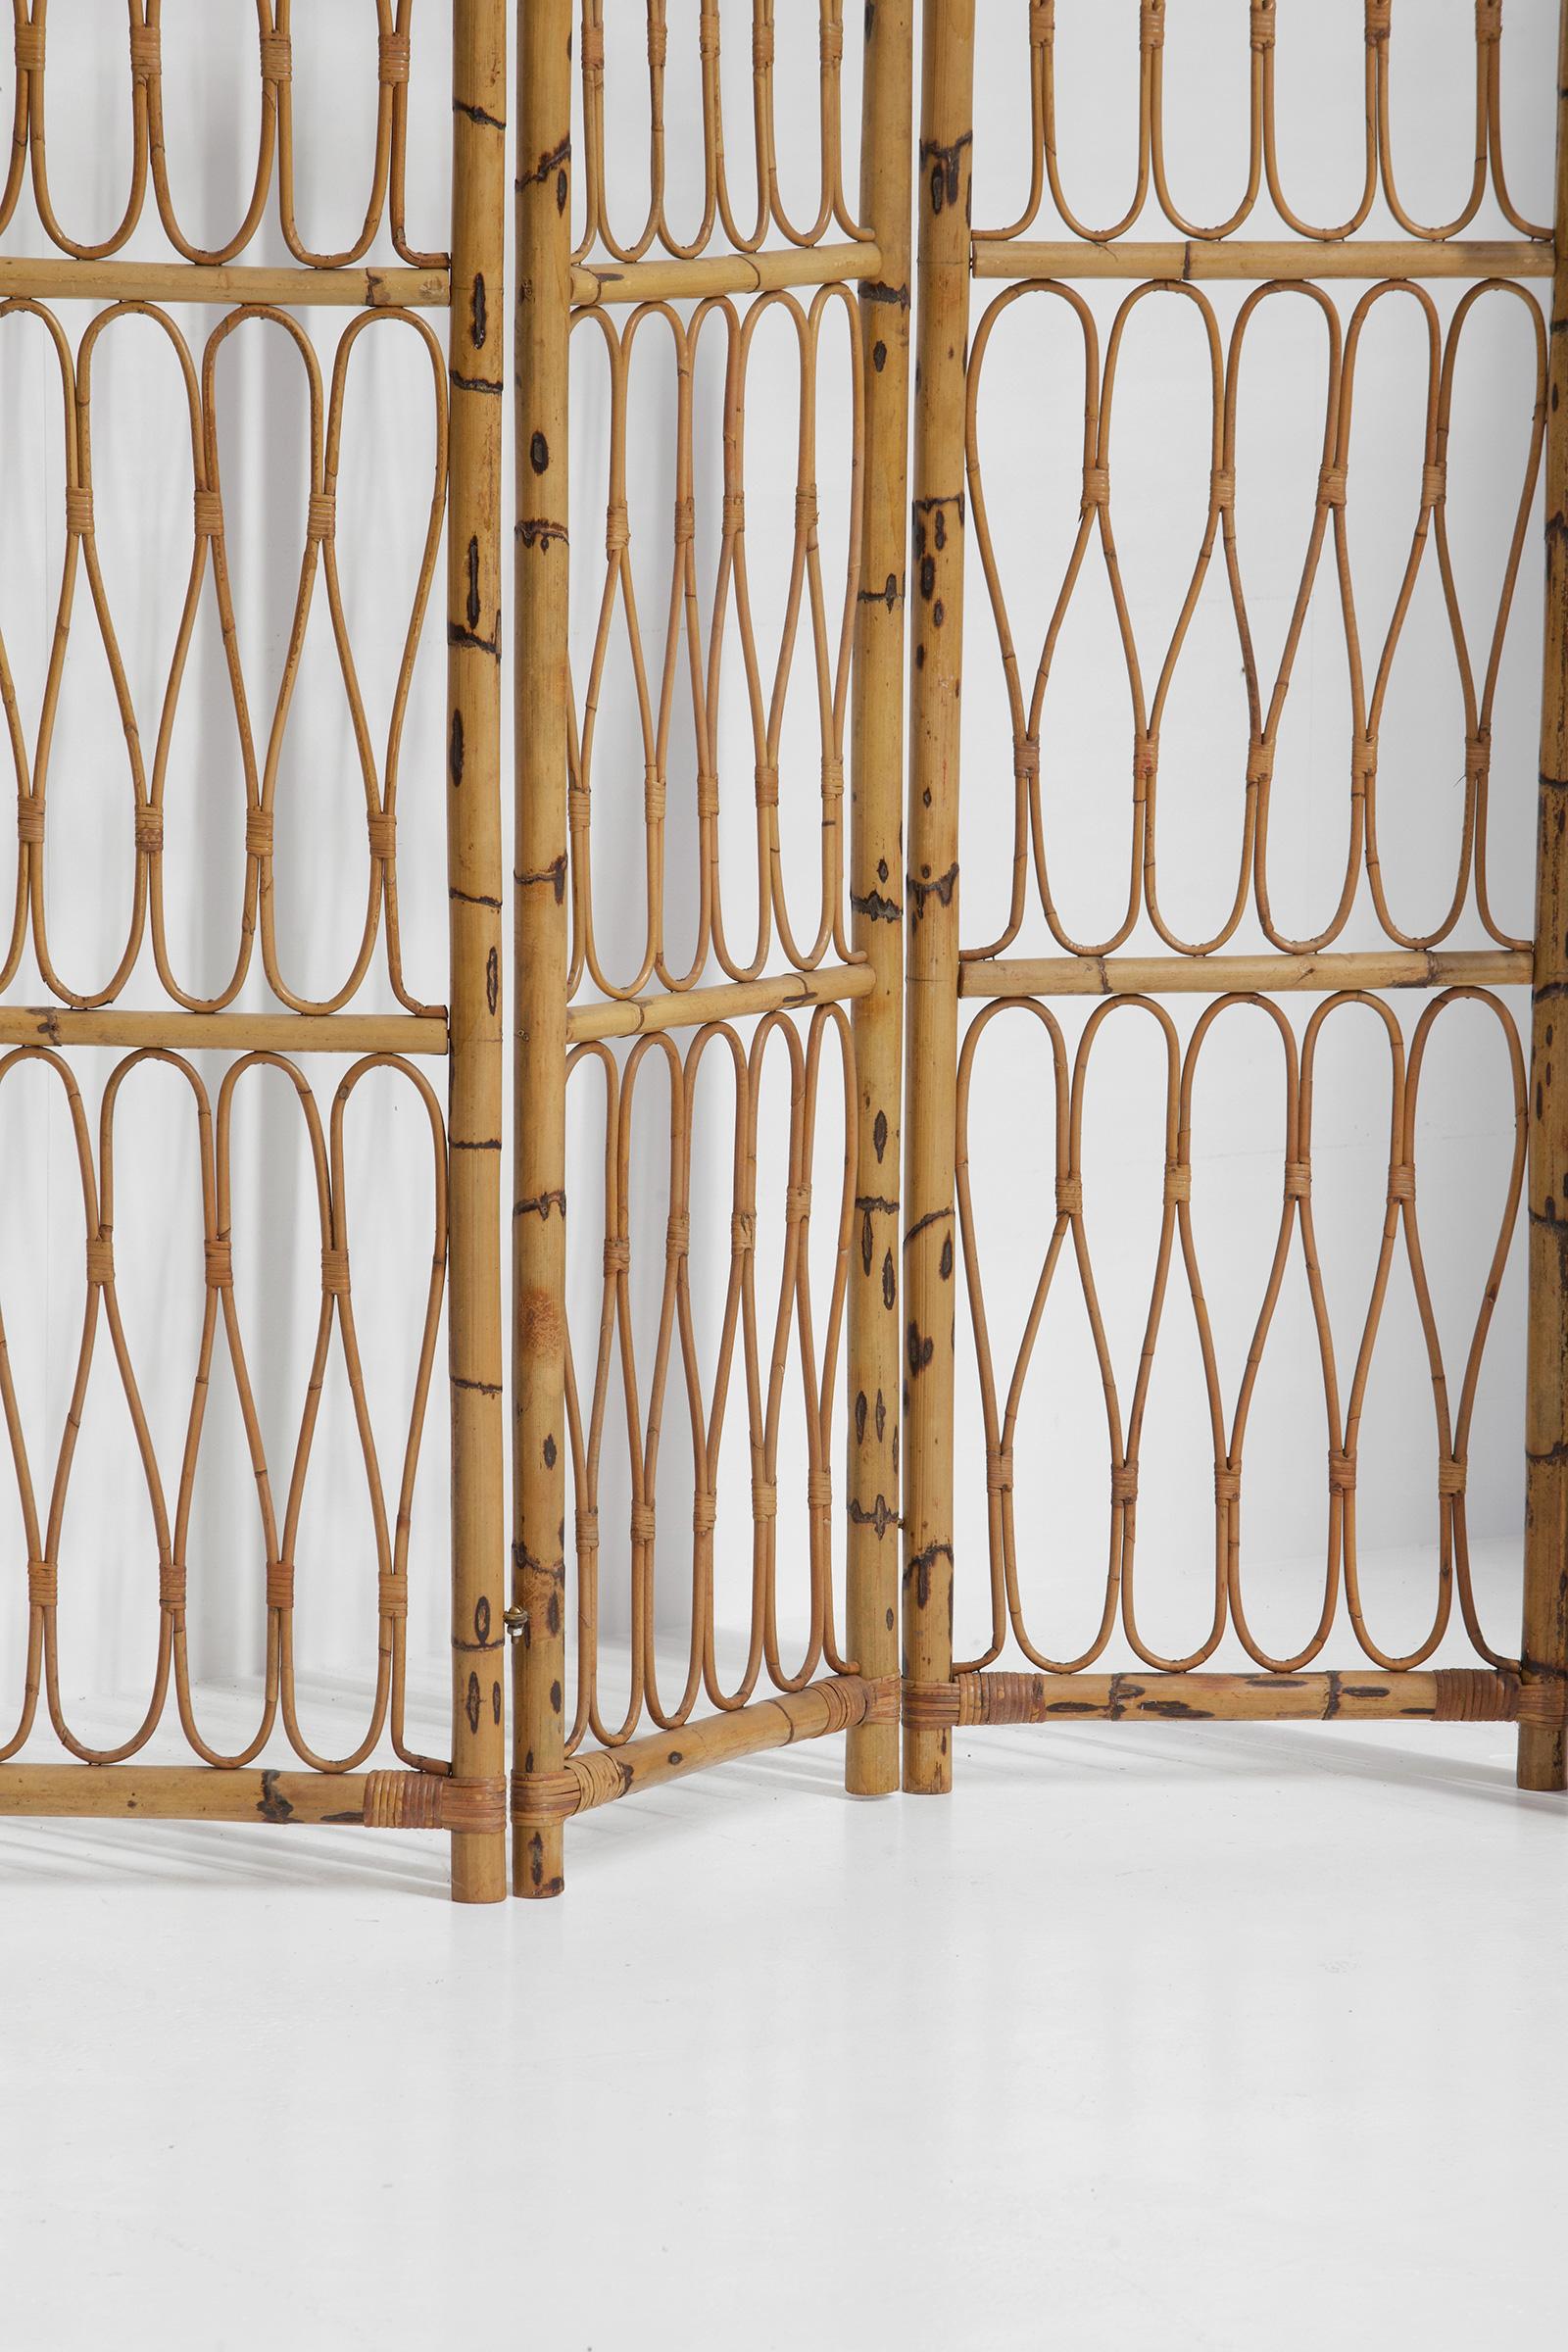 1950s Decorative Rattan Folding Screen